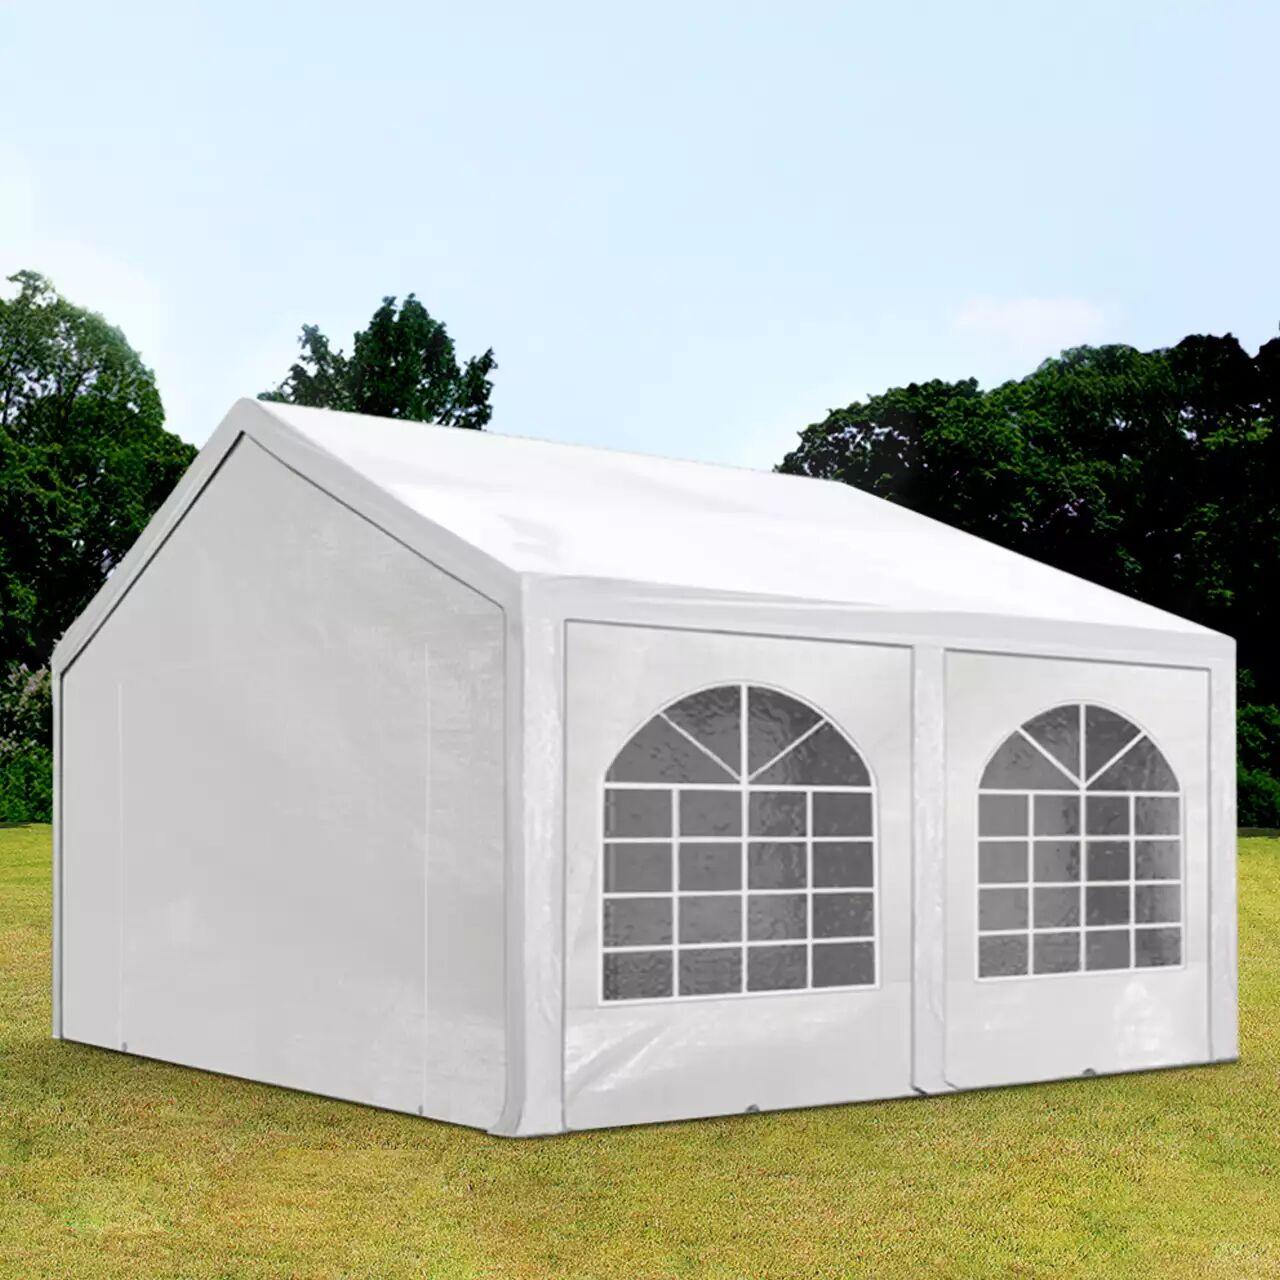 TOOLPORT Partyzelt 3x5m PE 240g/m² weiß wasserdicht Gartenzelt, Festzelt, Pavillon